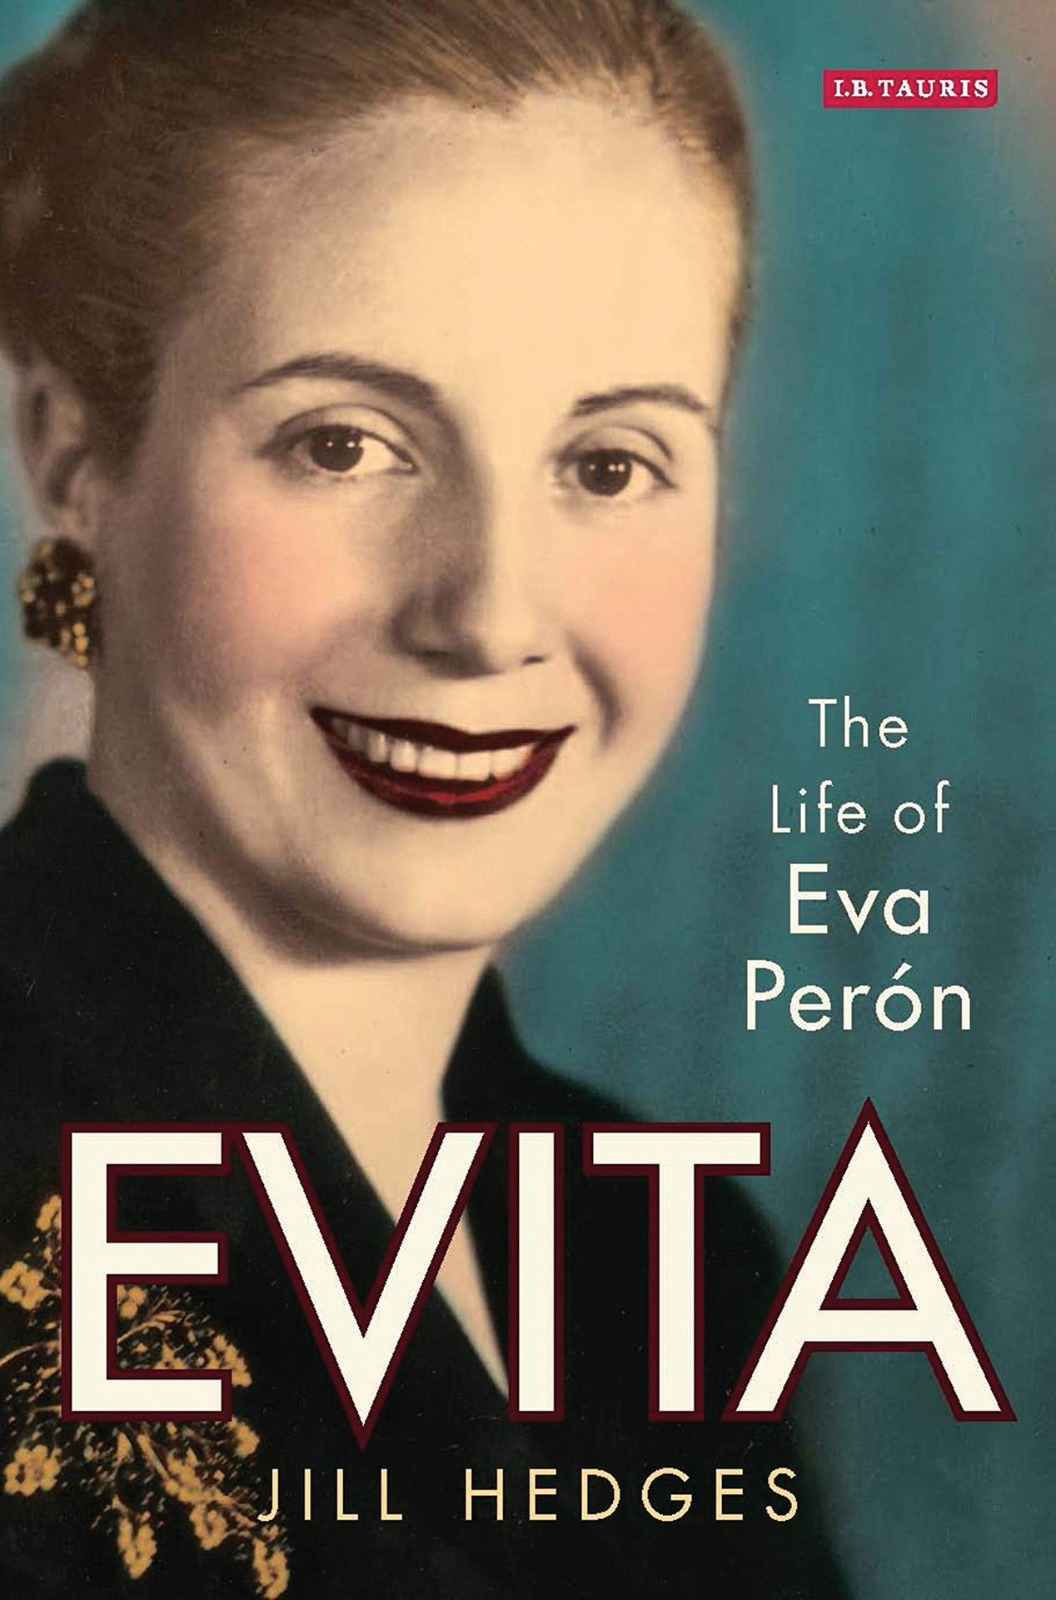 Evita Eva Peron jil hedges